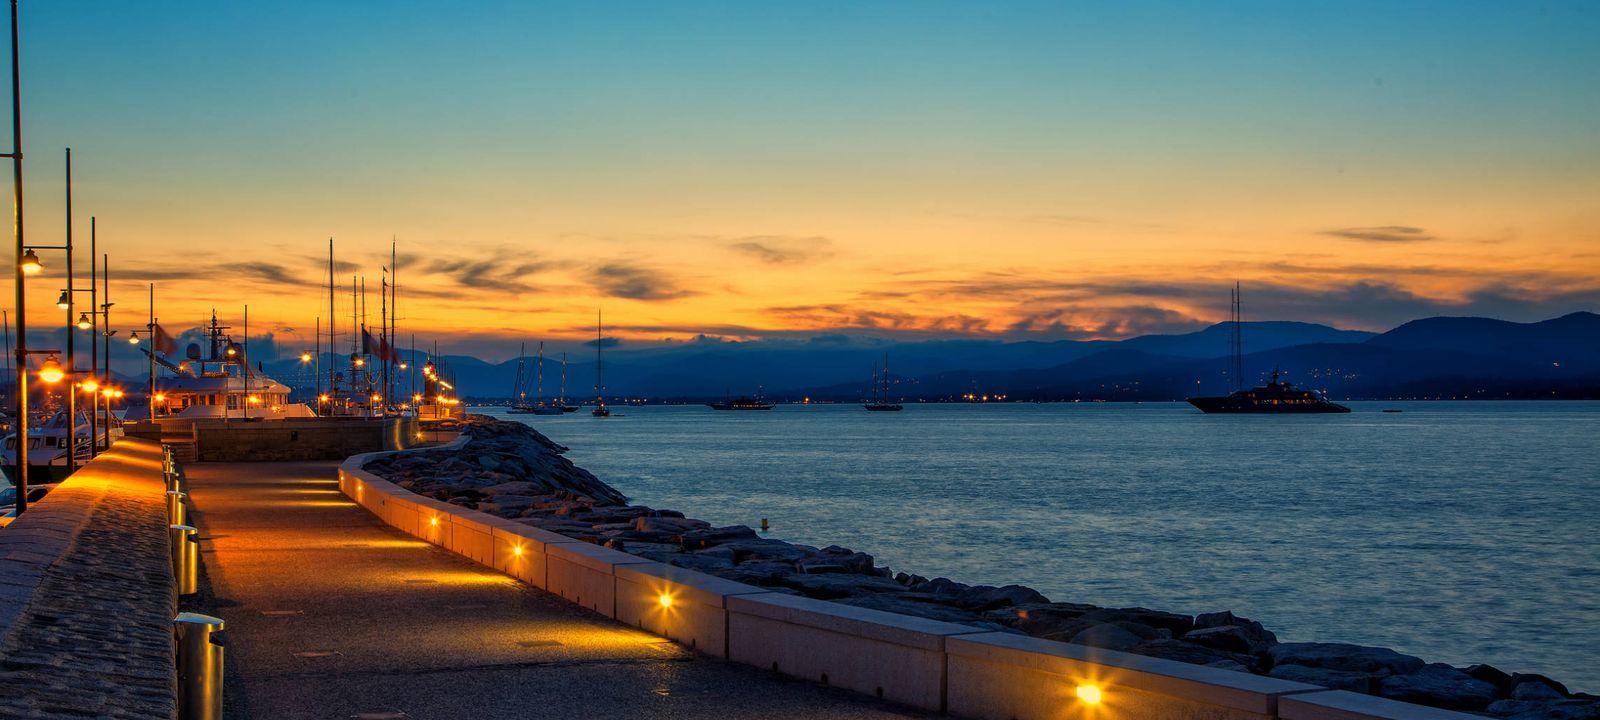 Foto: St Tropez sunset